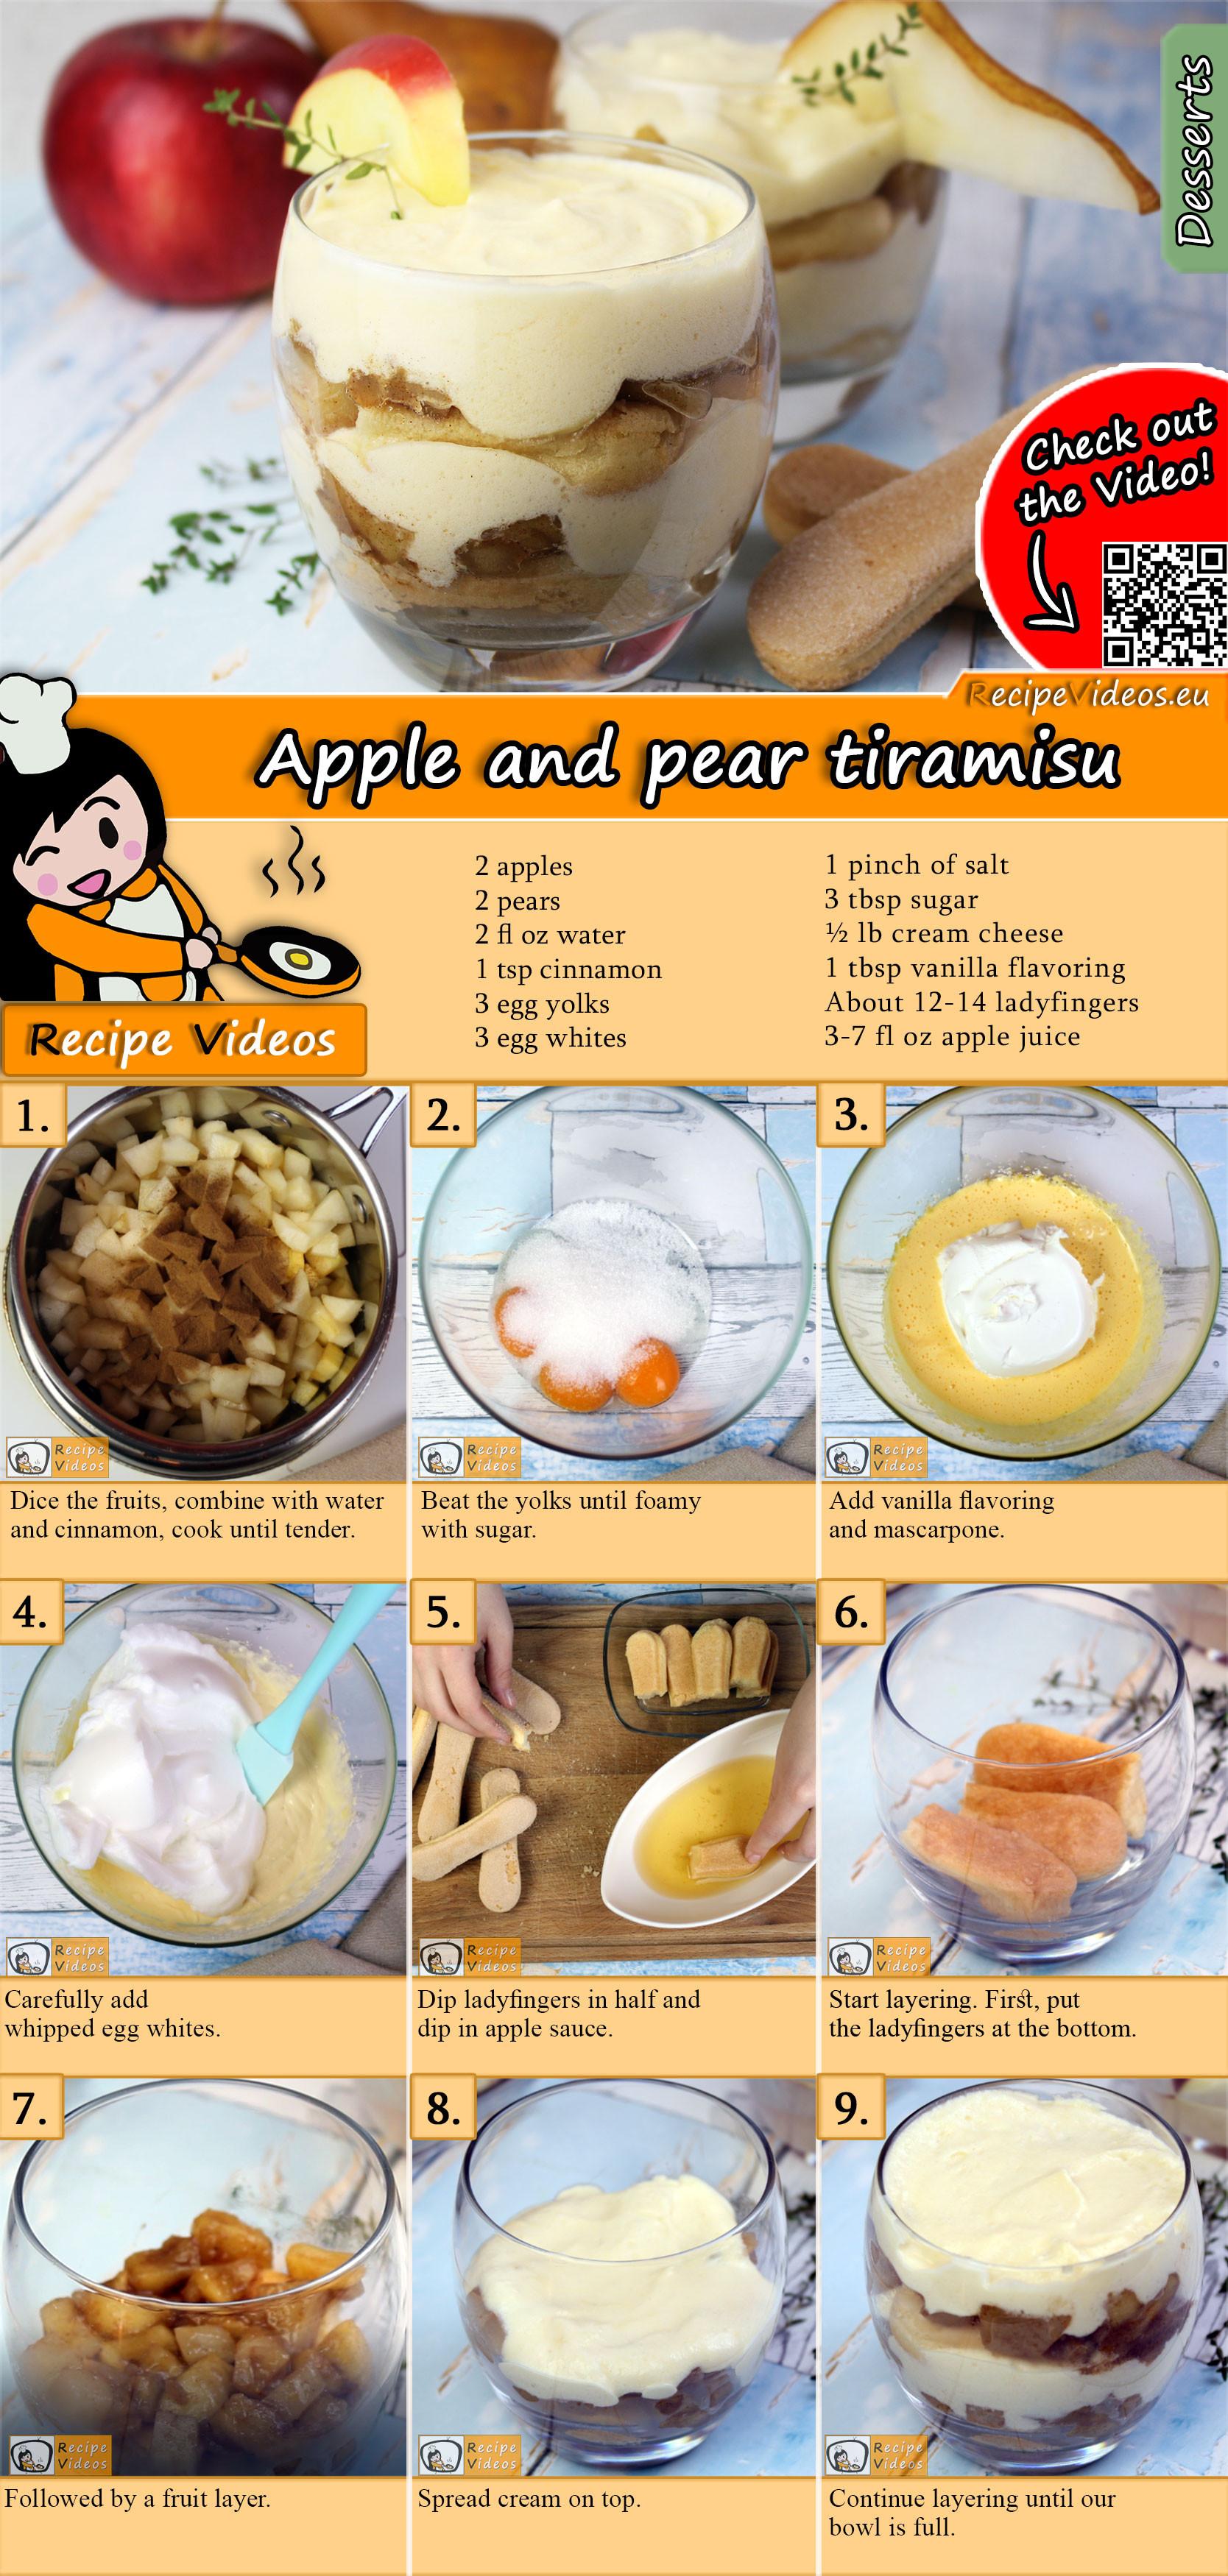 Apple and pear tiramisu recipe with video